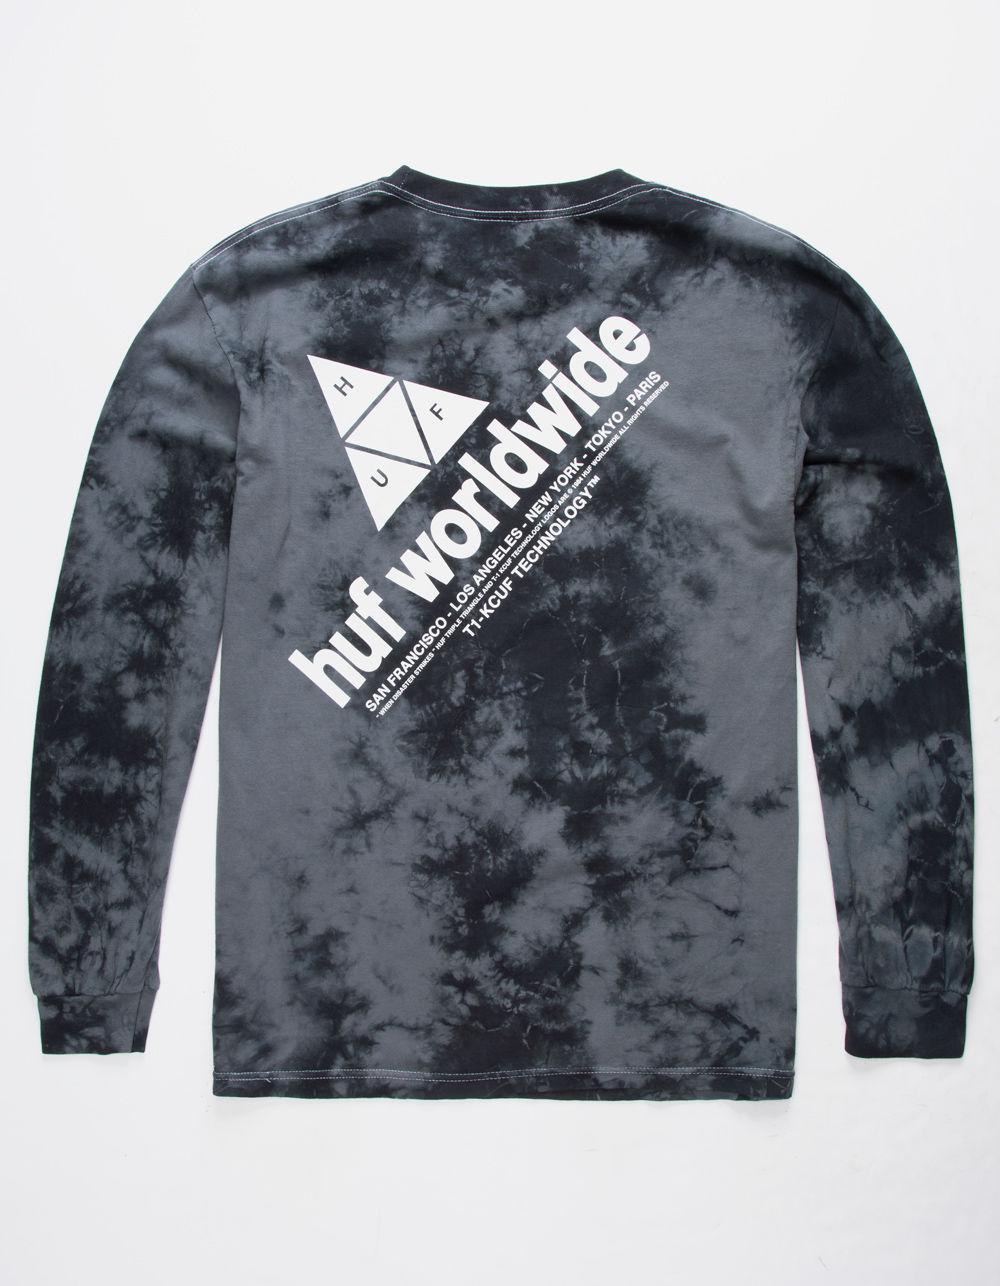 033b04684ffb2 Lyst - Huf Peak Logo Mens T-shirt in Black for Men